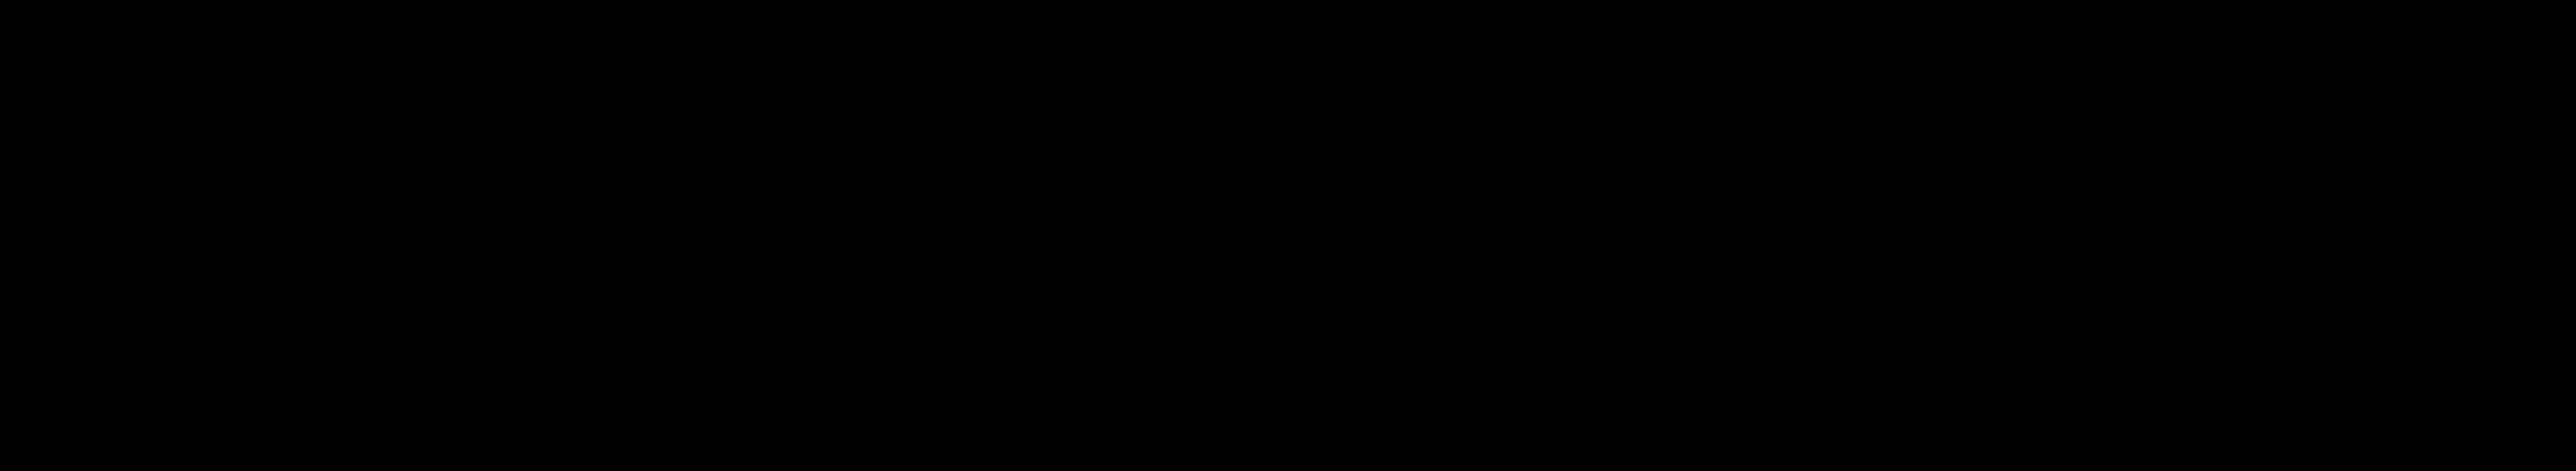 Yuneec_logo